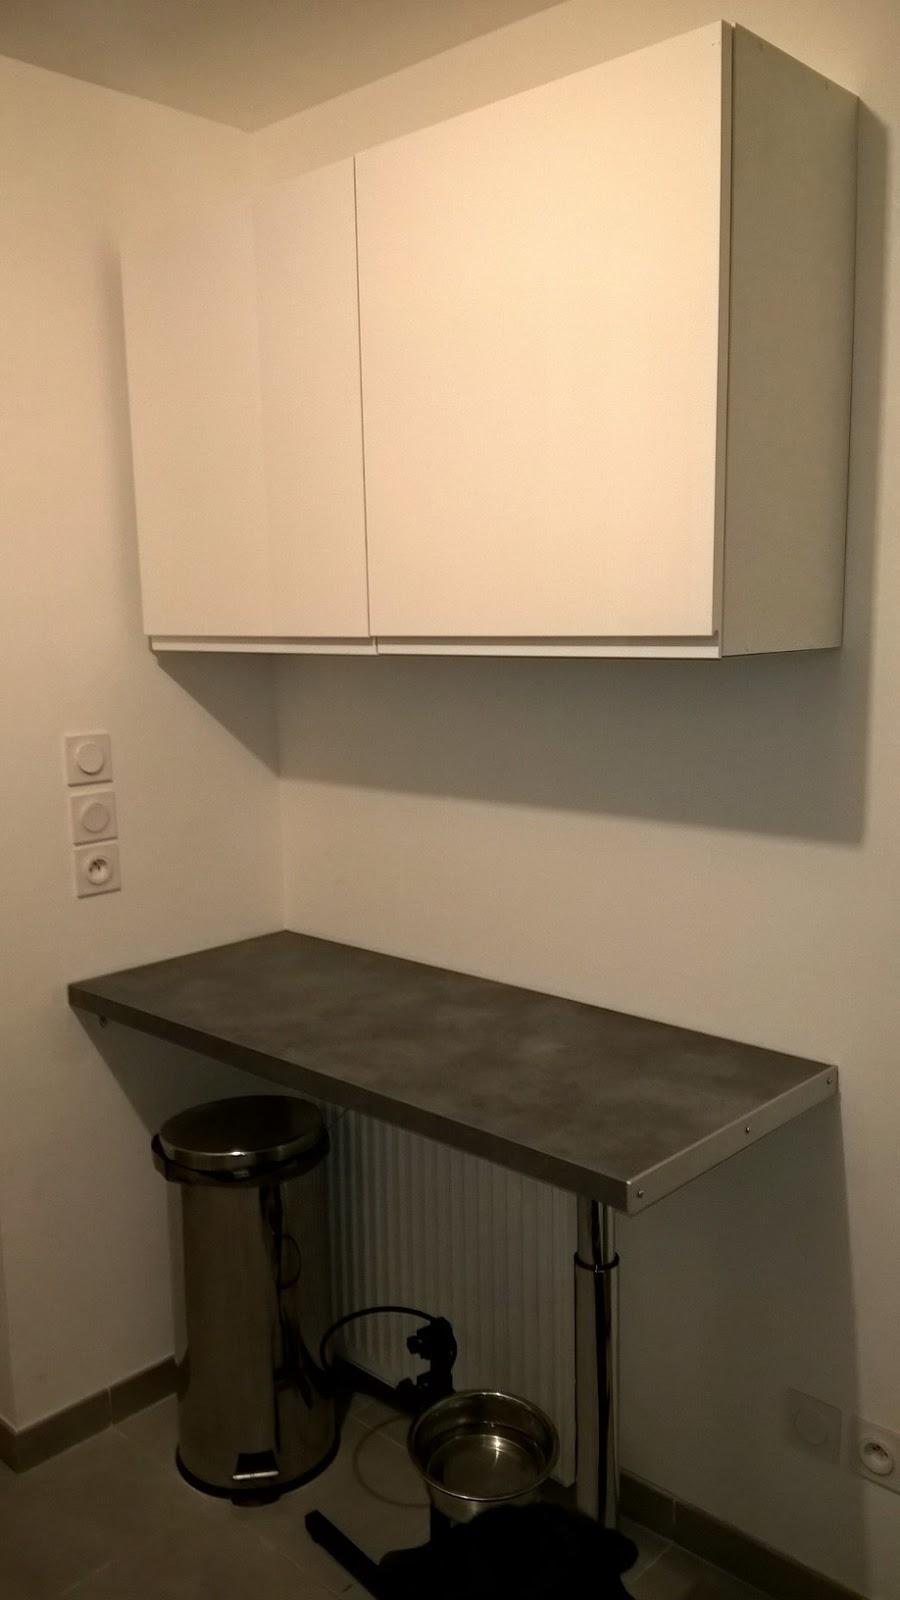 meubles raccordement plomberie